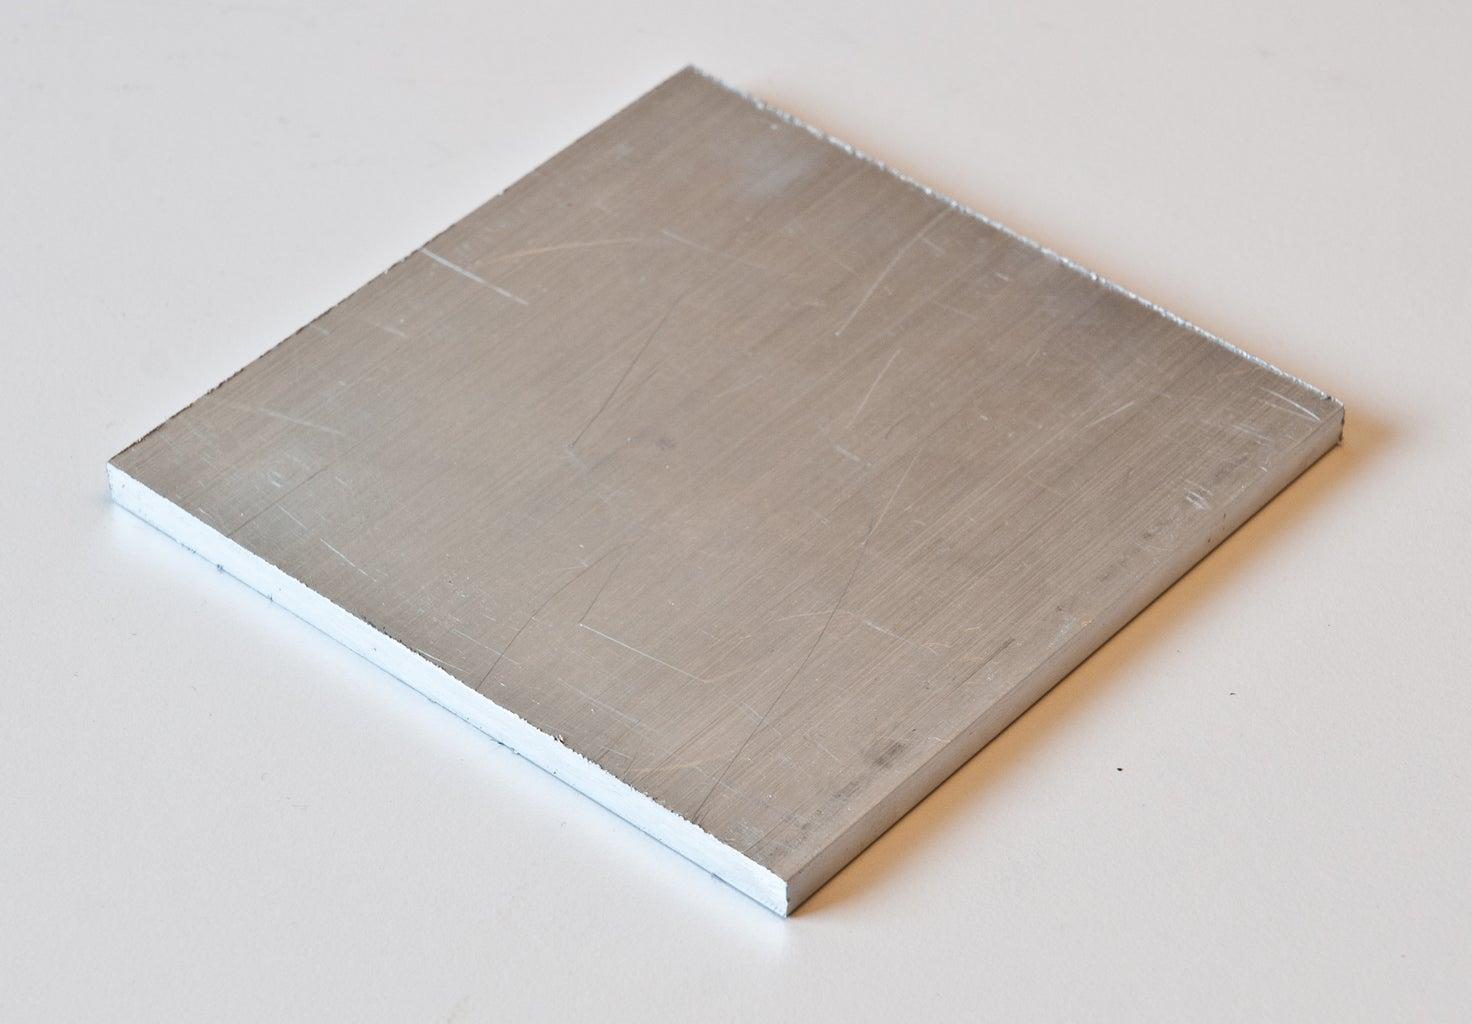 Construction (Base Plate)